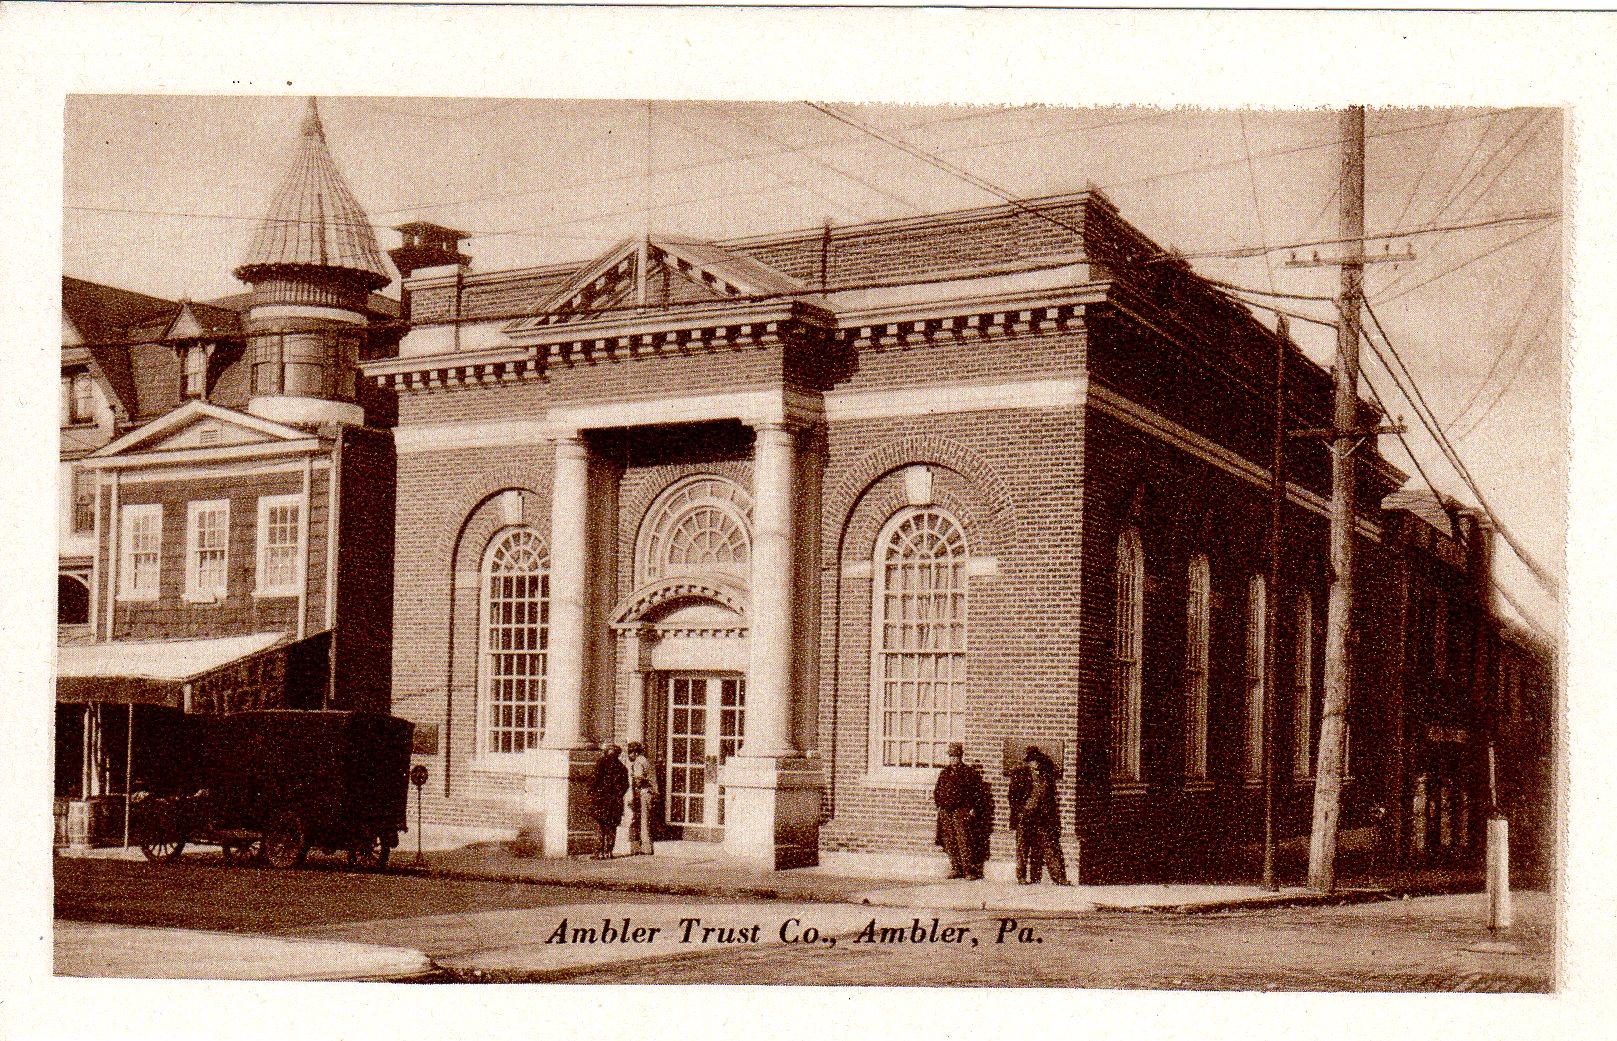 Post Card Collection (E Simon)_2682_57_Ambler Trust Co, Ambler, Pa